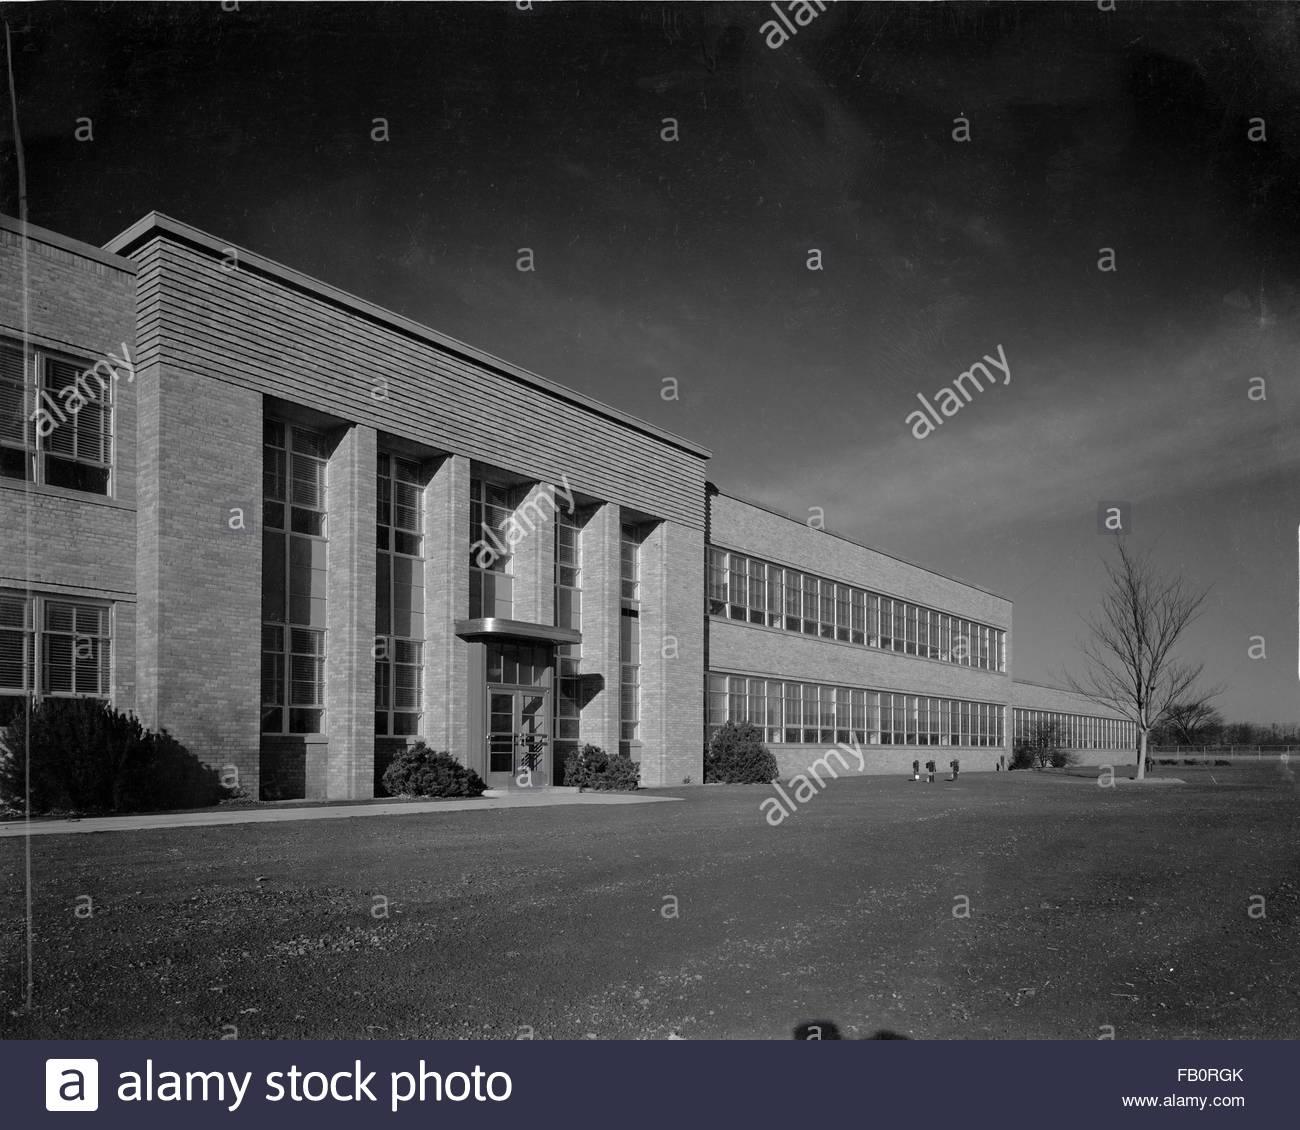 Toledo Scale plant in Ohio, 1939 Dec. 27. Exterior, building entrance - Stock Image